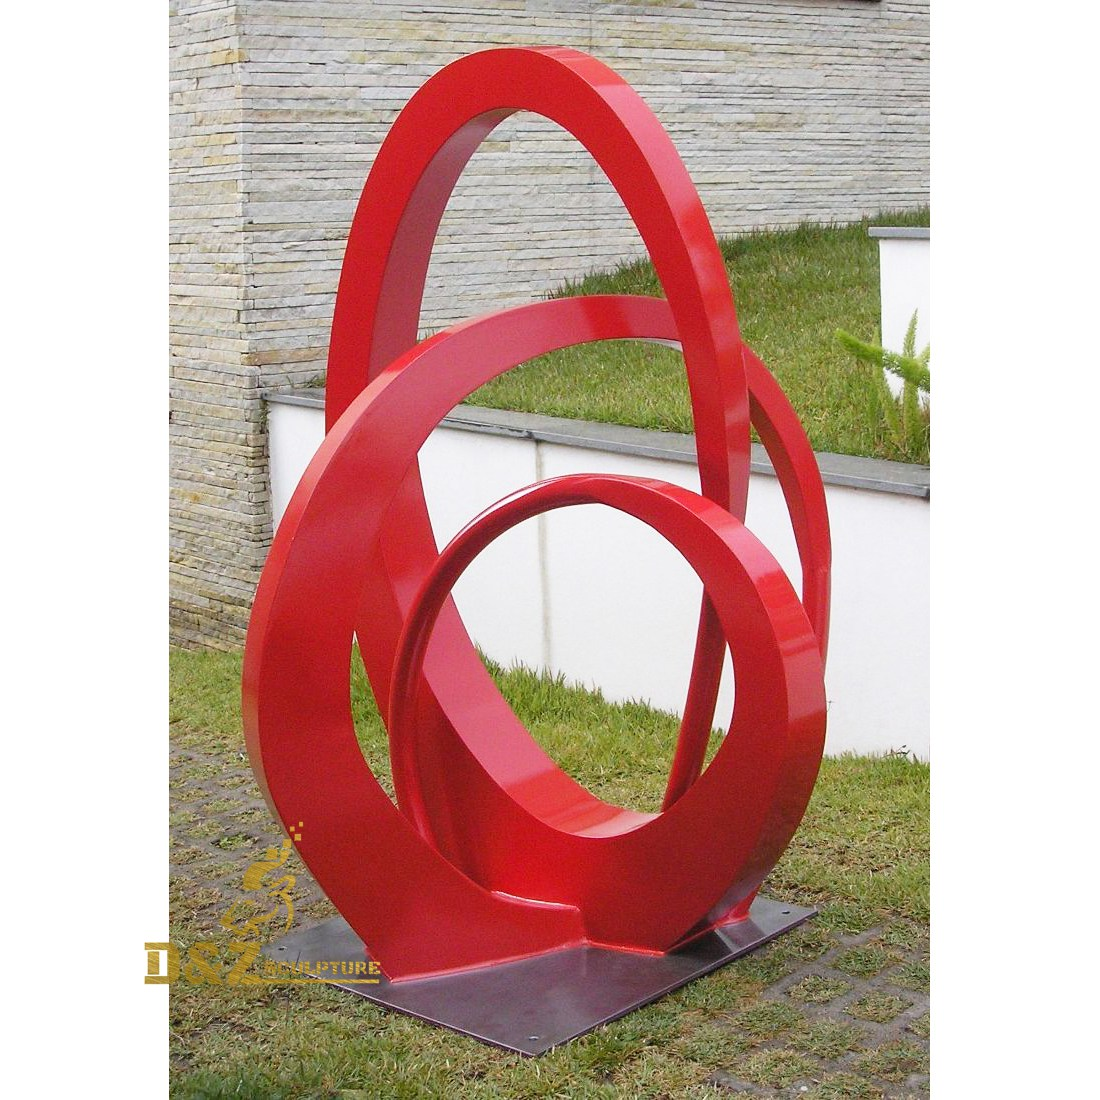 Circular cross sculpture